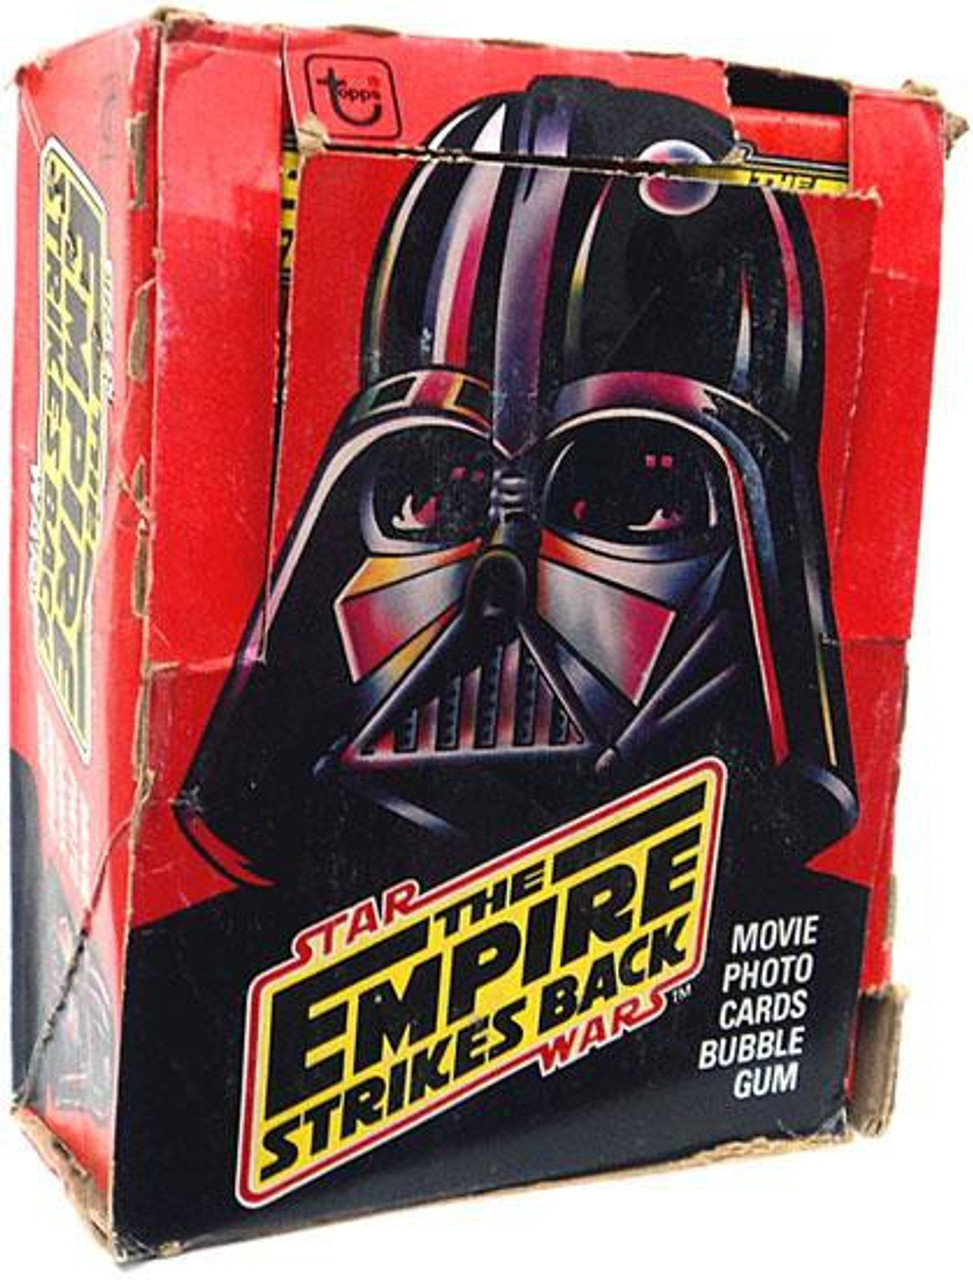 Star Wars The Empire Strikes Back Trading Card Box